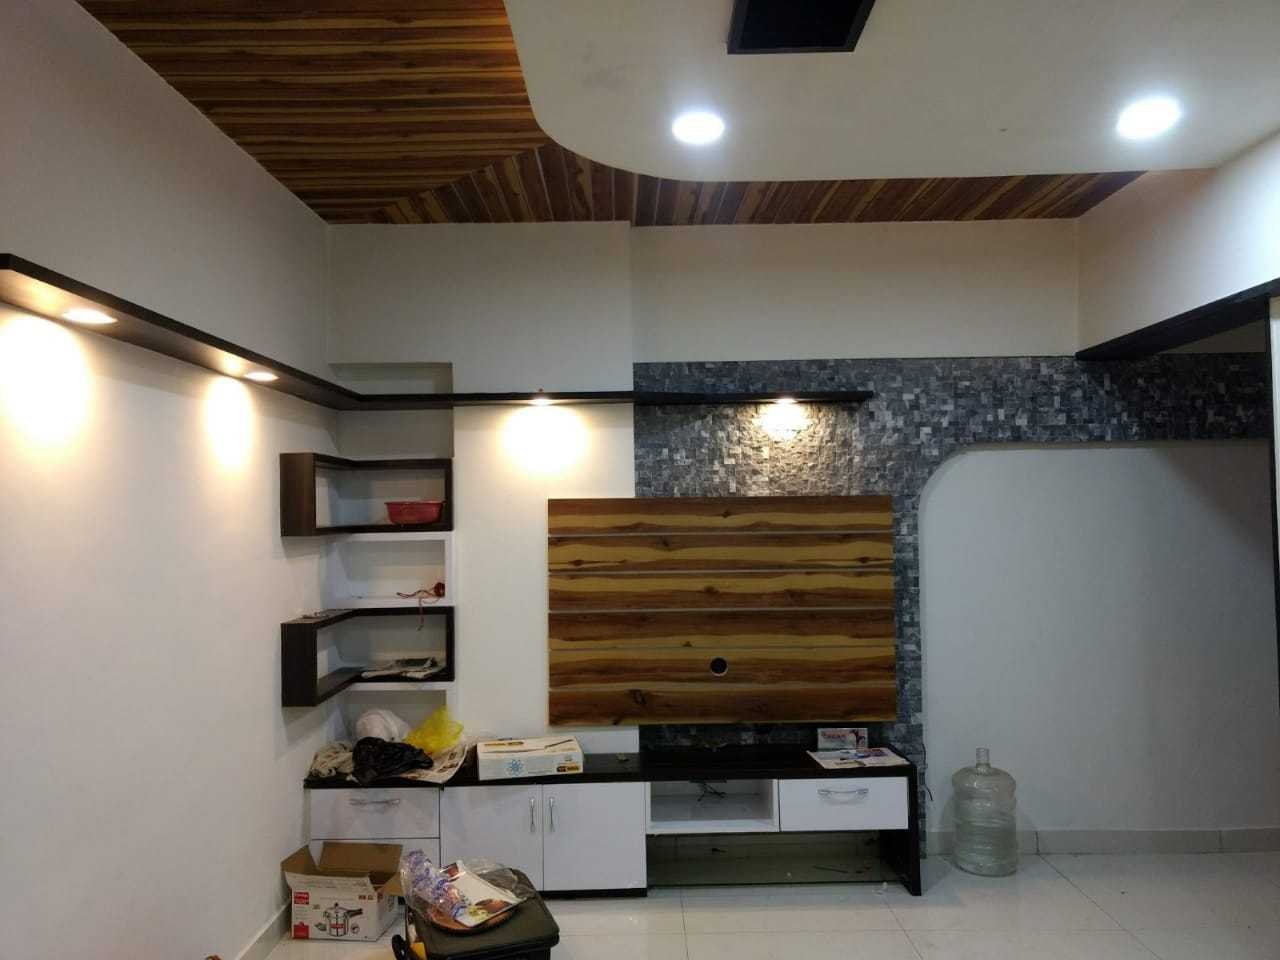 S H A P E S Interiors Landscapes In Chansandra Bangalore 560067 Sulekha Bangalore